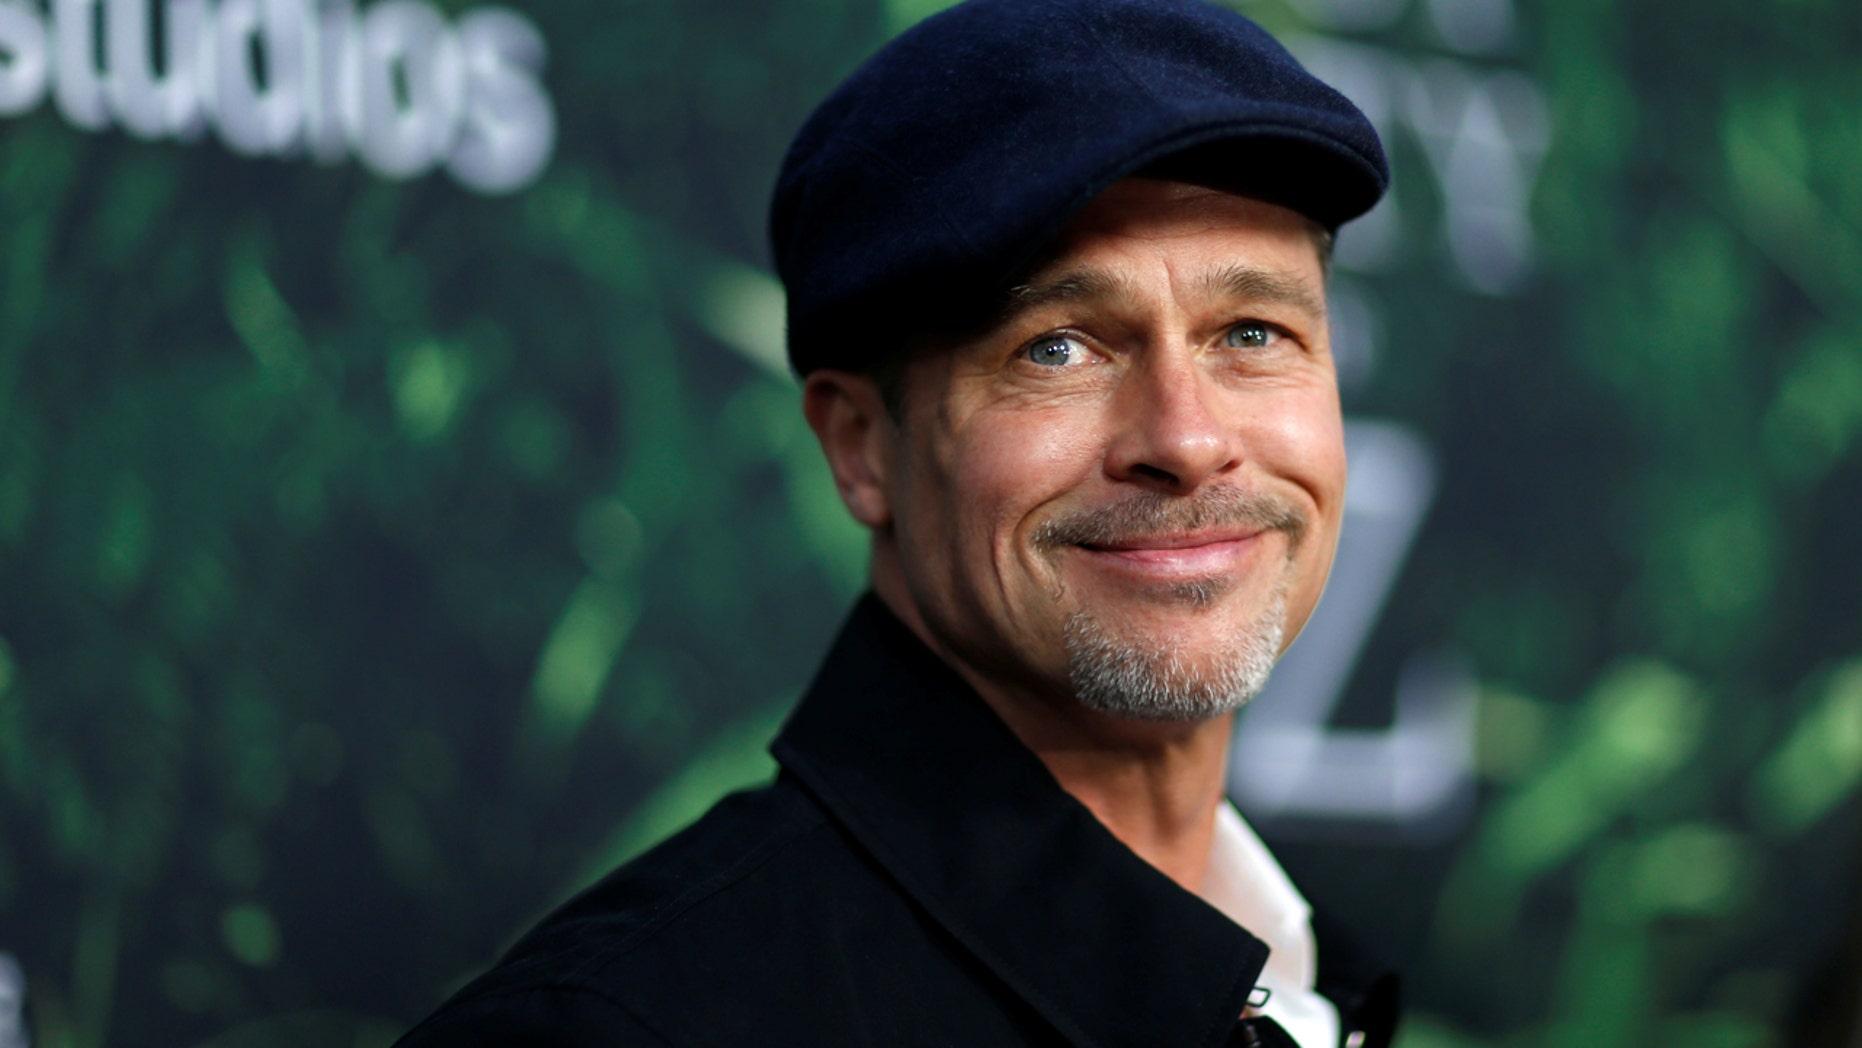 Brad Pitt to star with Leonardo Dicaprio in Tarantino's